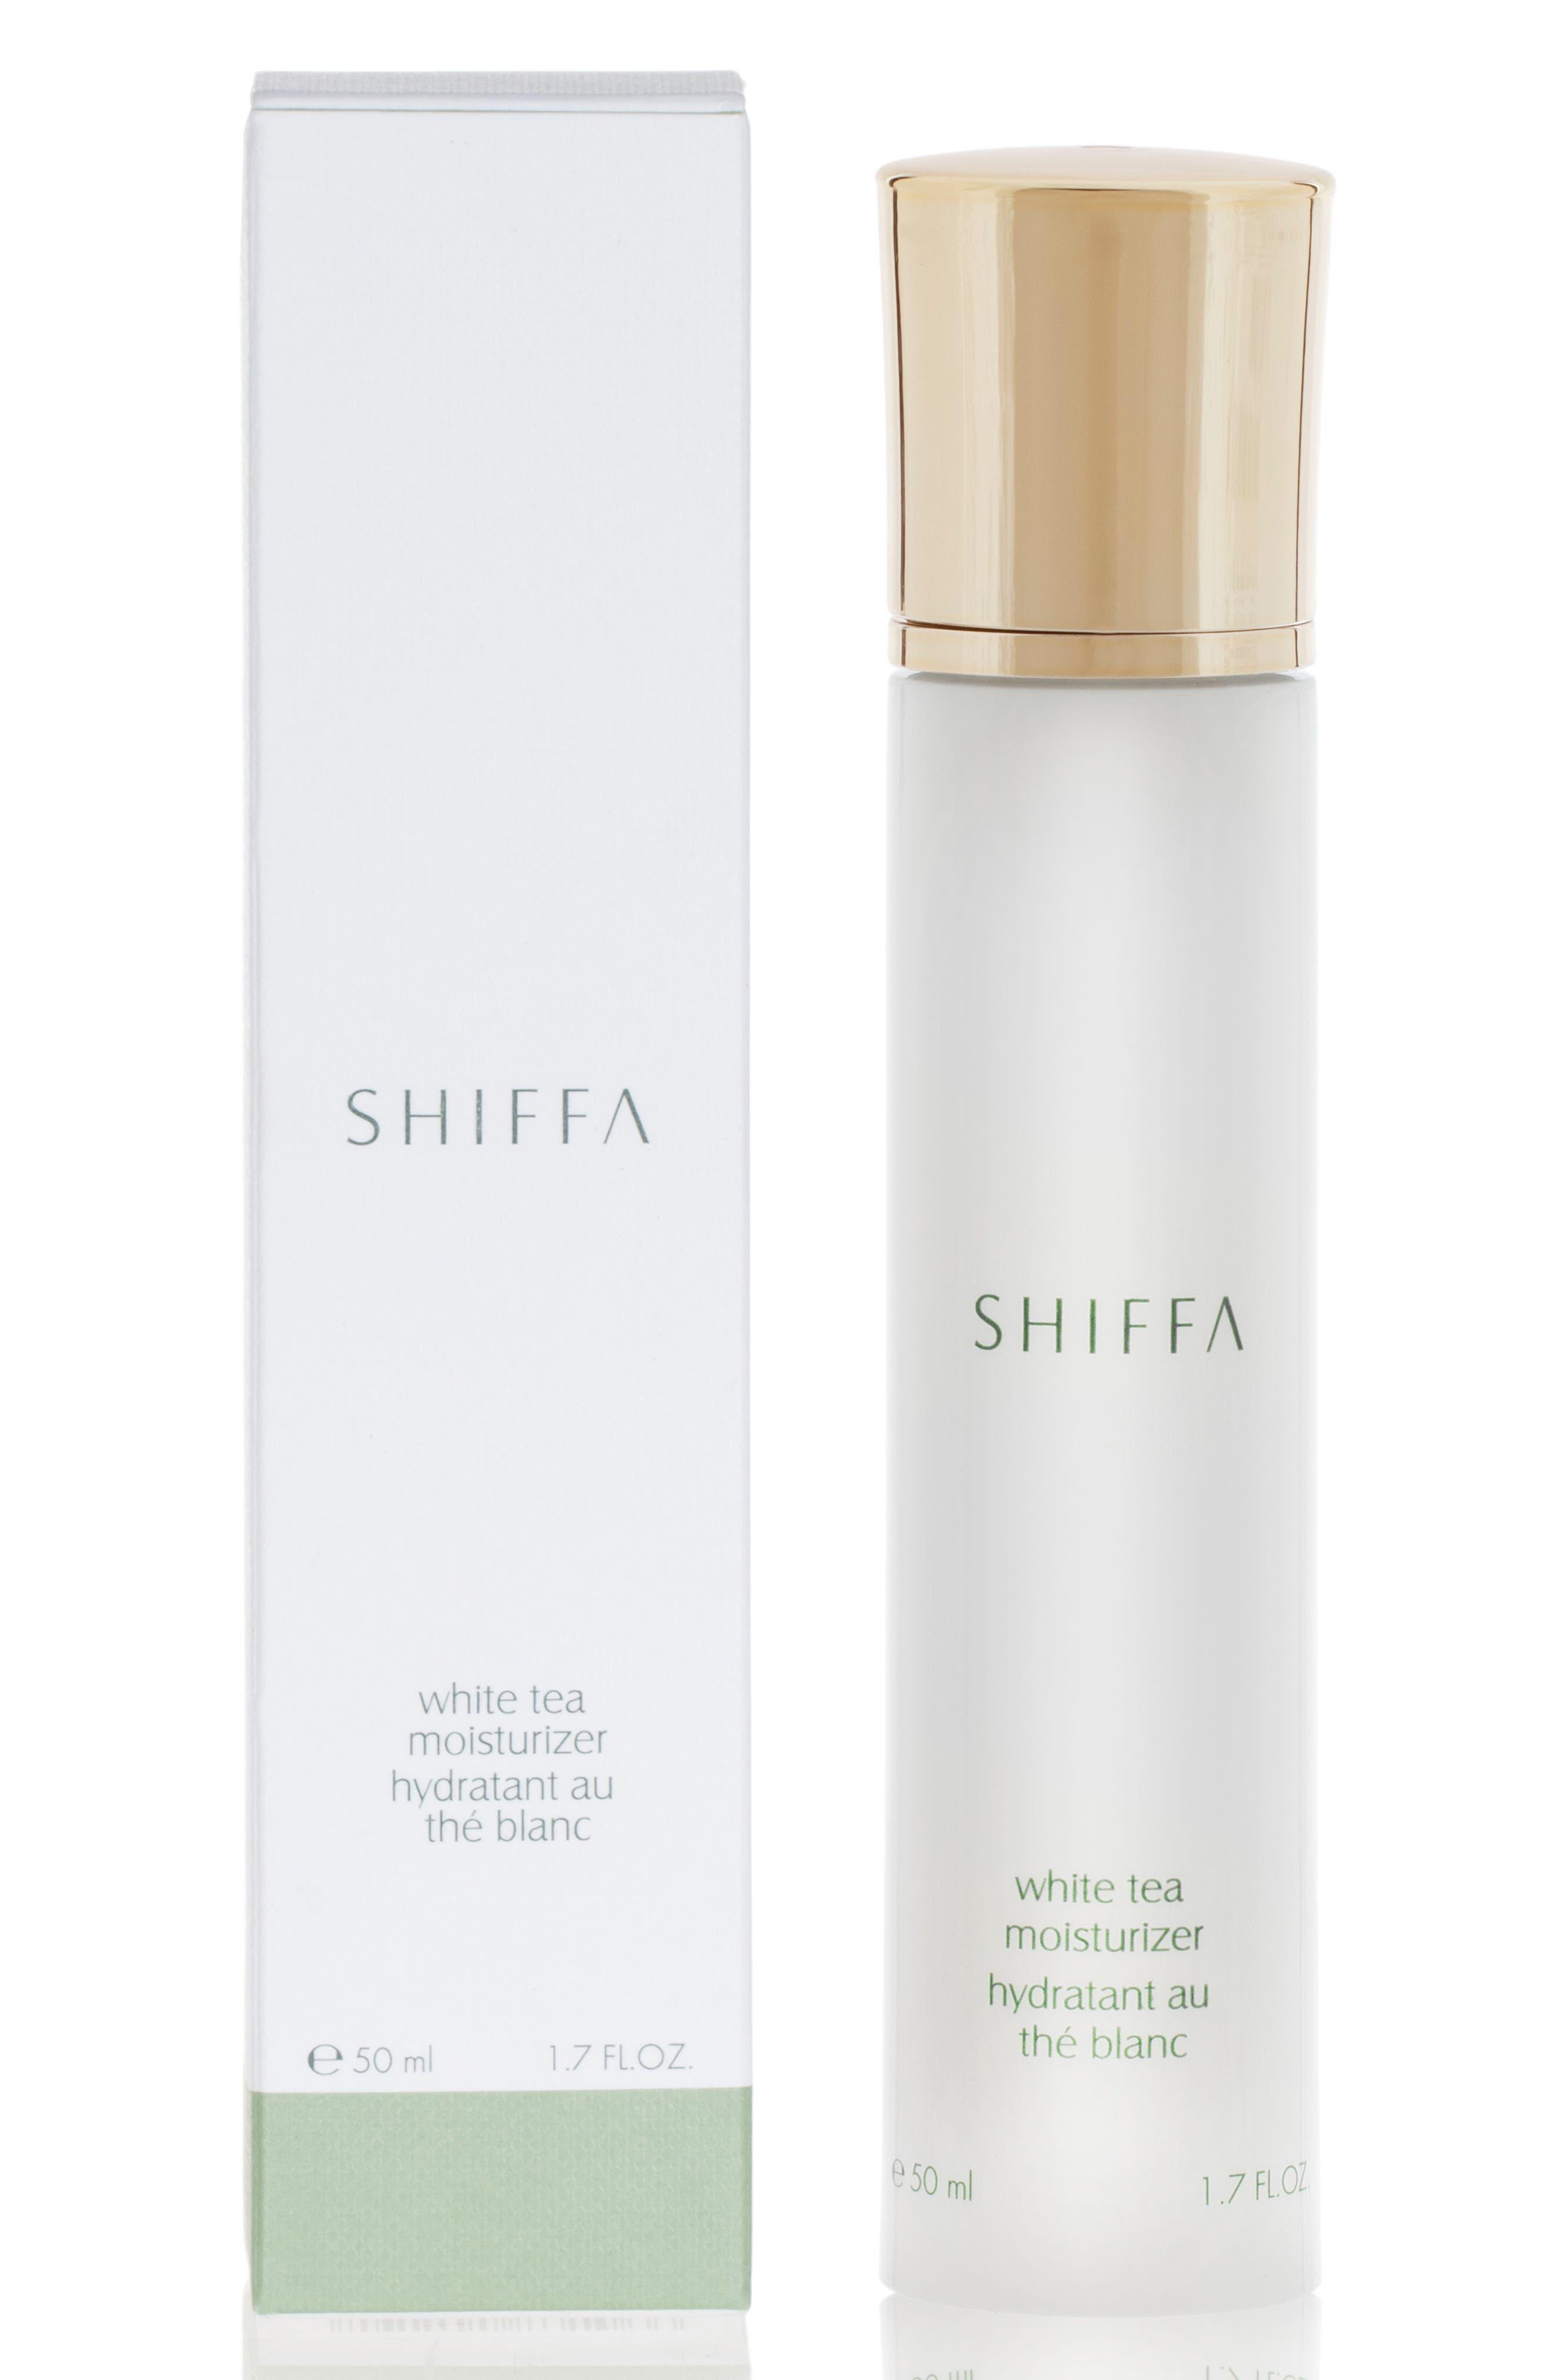 Shiffa White Tea Moisturizer